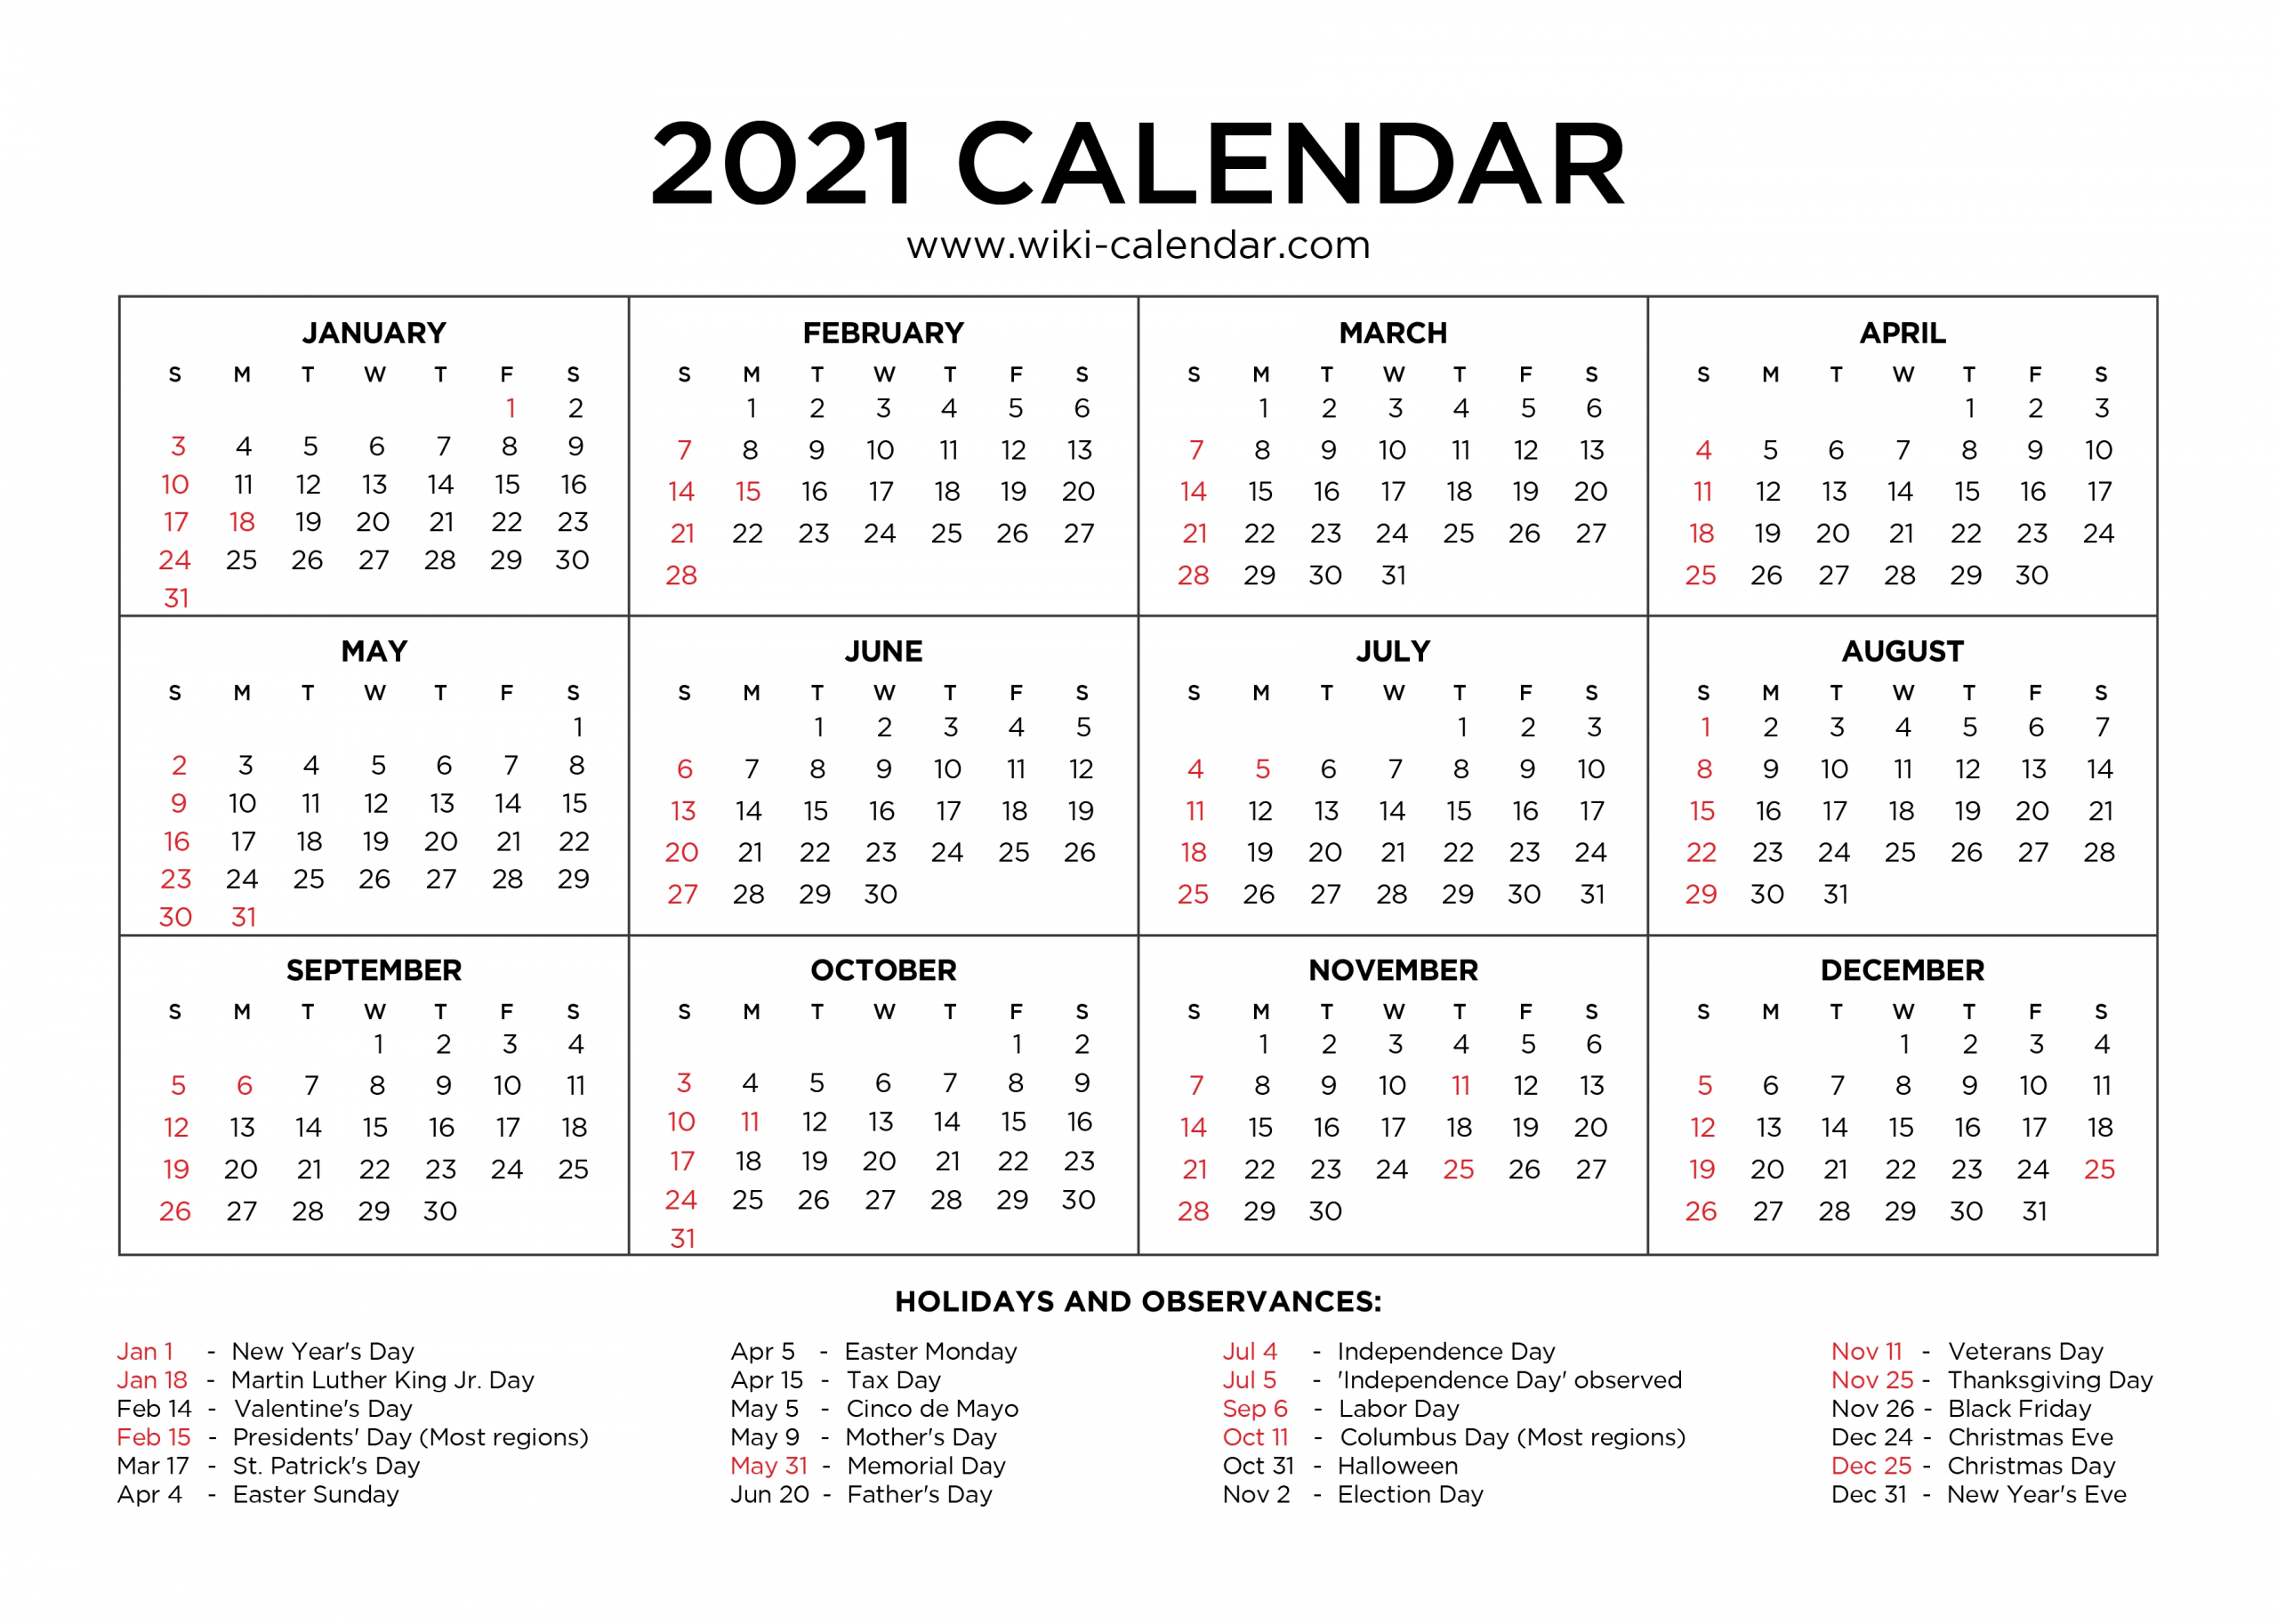 Effective Free Downloadable 2021 Calendar | Get Your